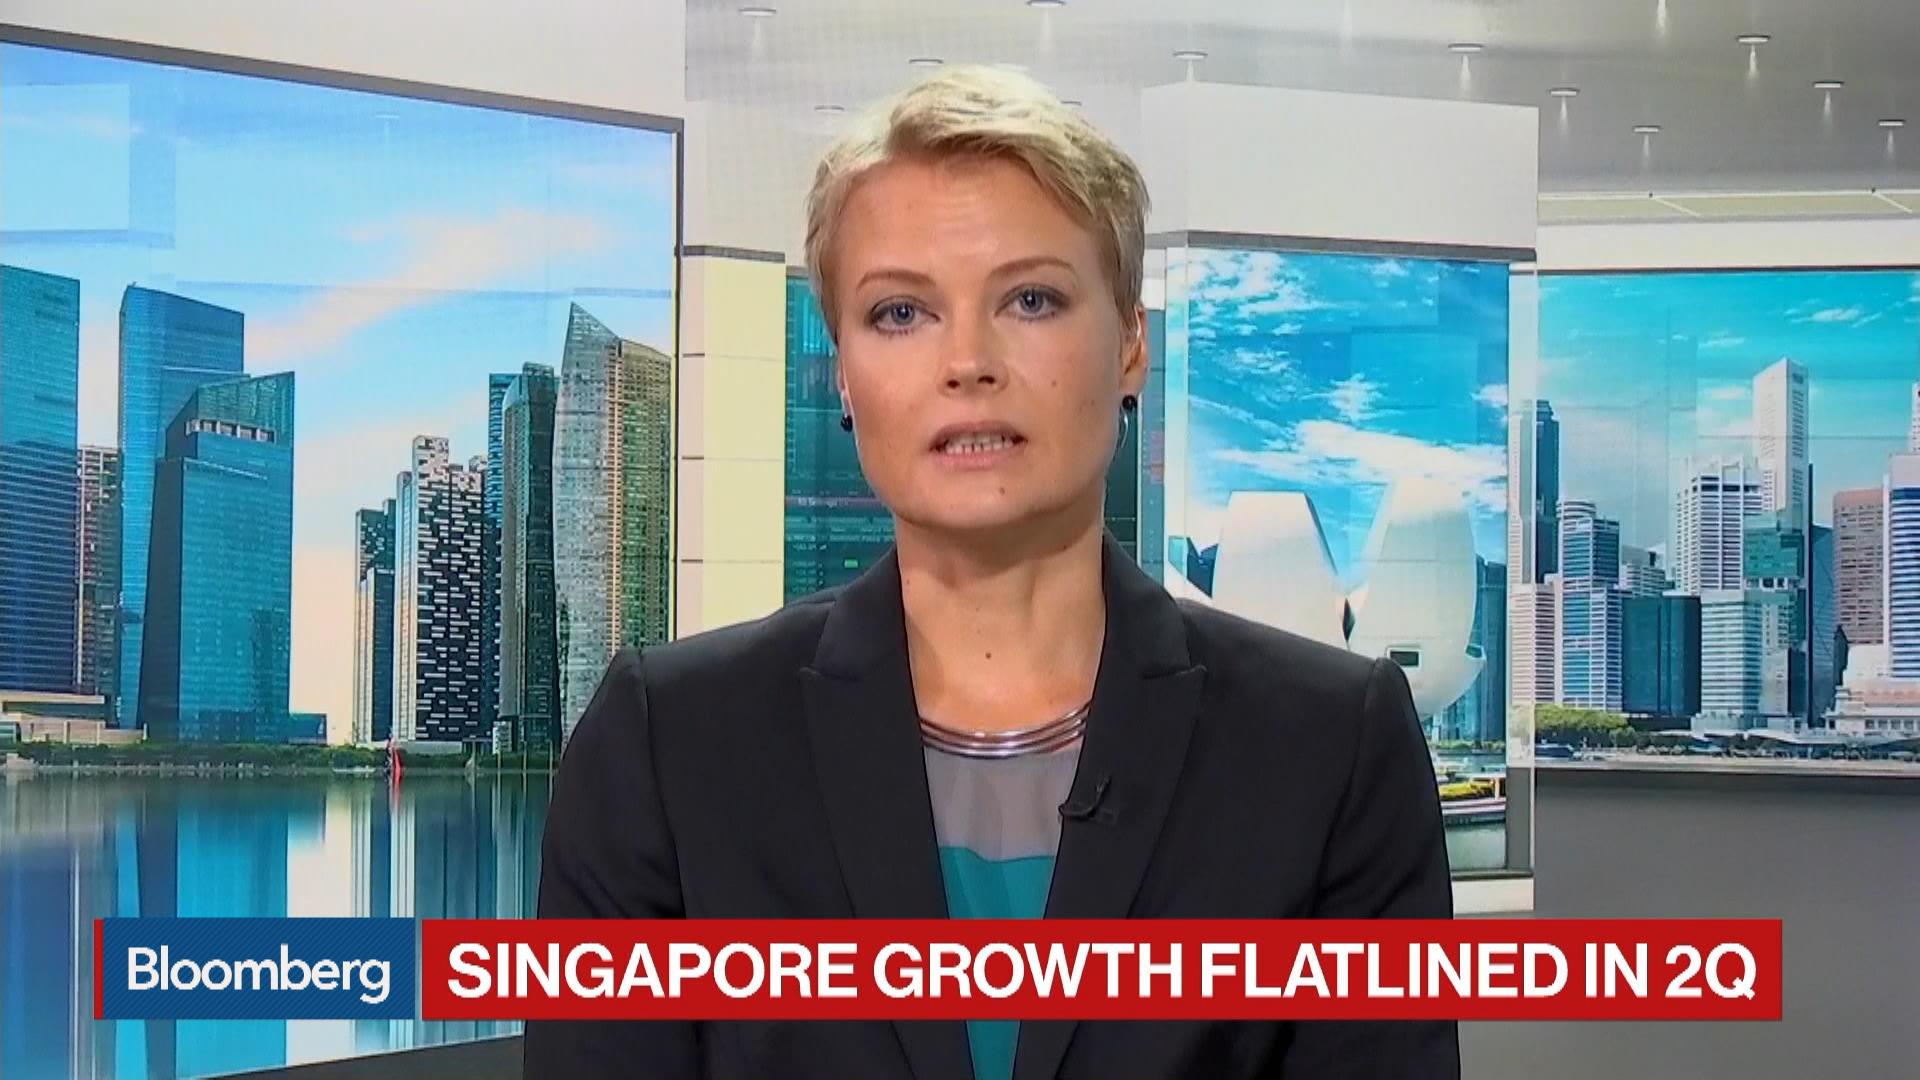 Bad News for World Trade as Singapore Slumps, China Exports